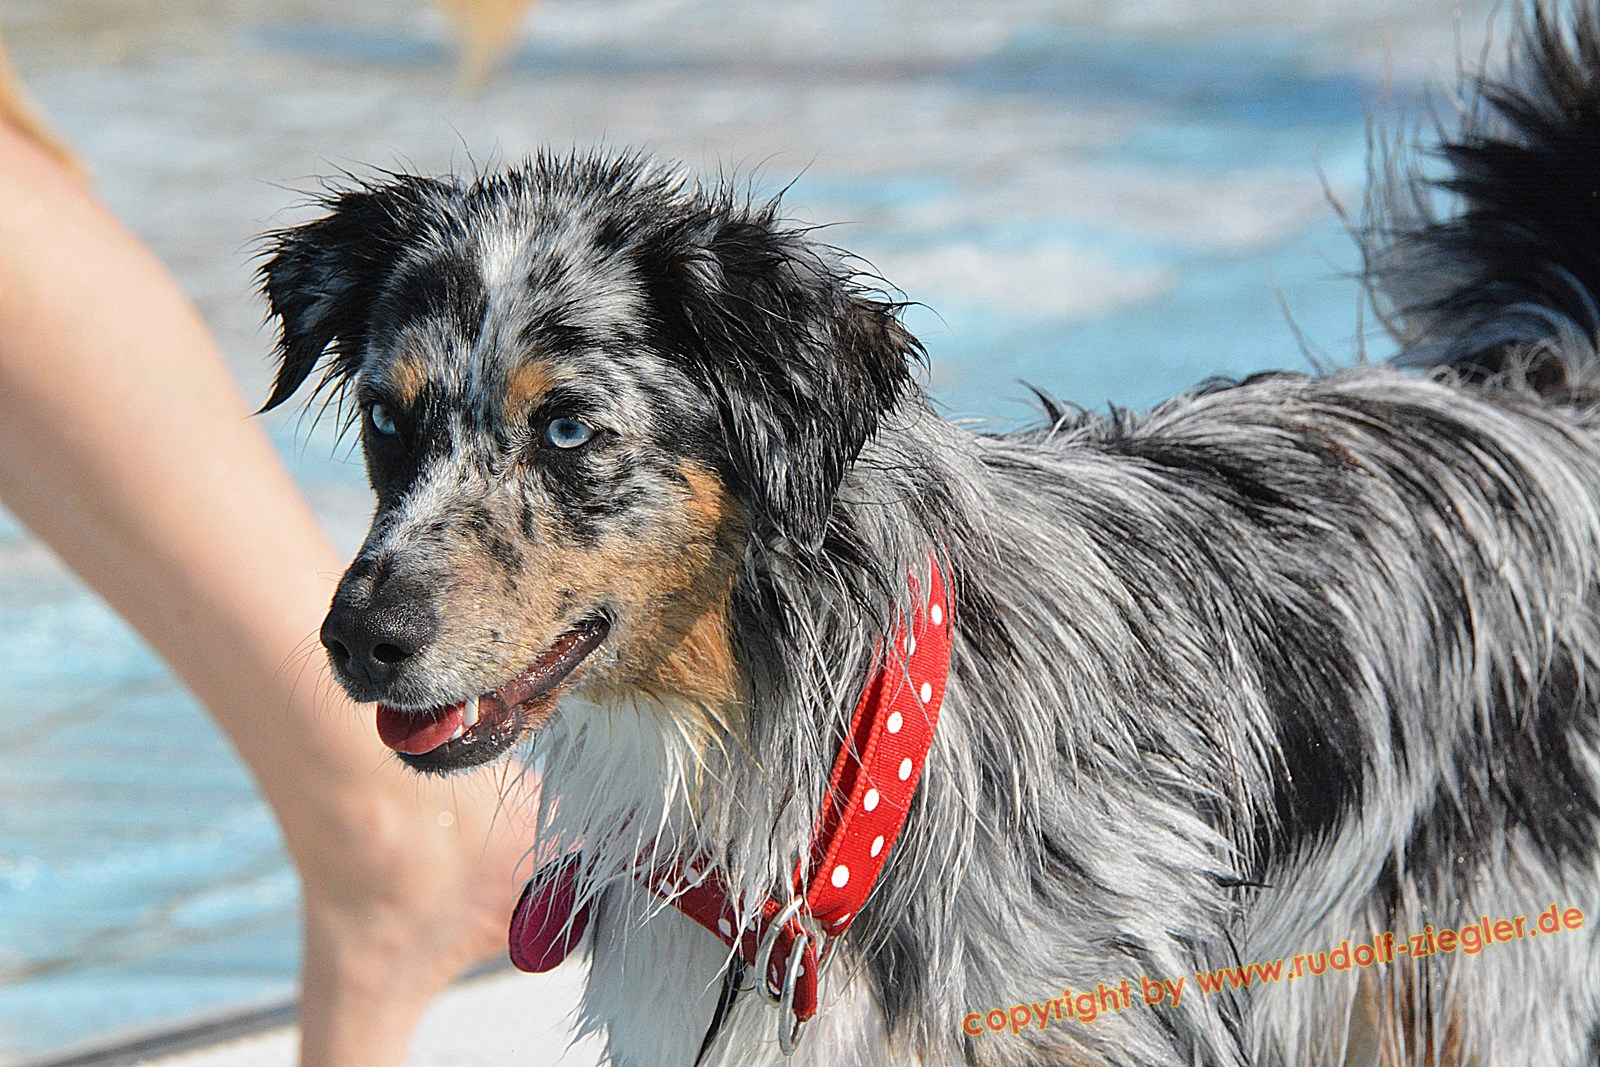 Hundebadetag im Kreuzsteinbad 2016 033-A-S (1600x1200)